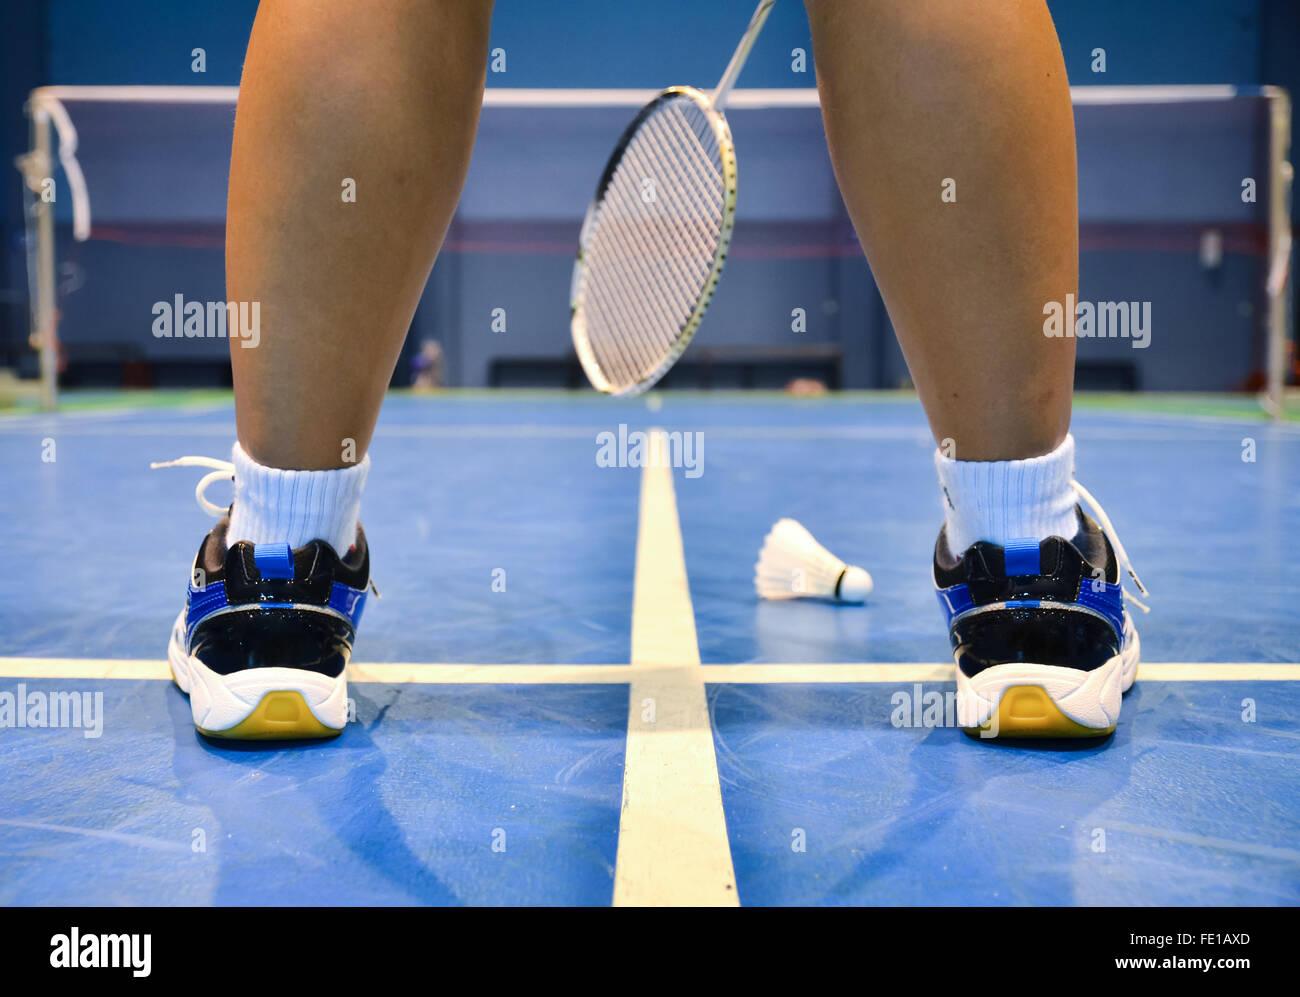 badminton court with badminton player - Stock Image